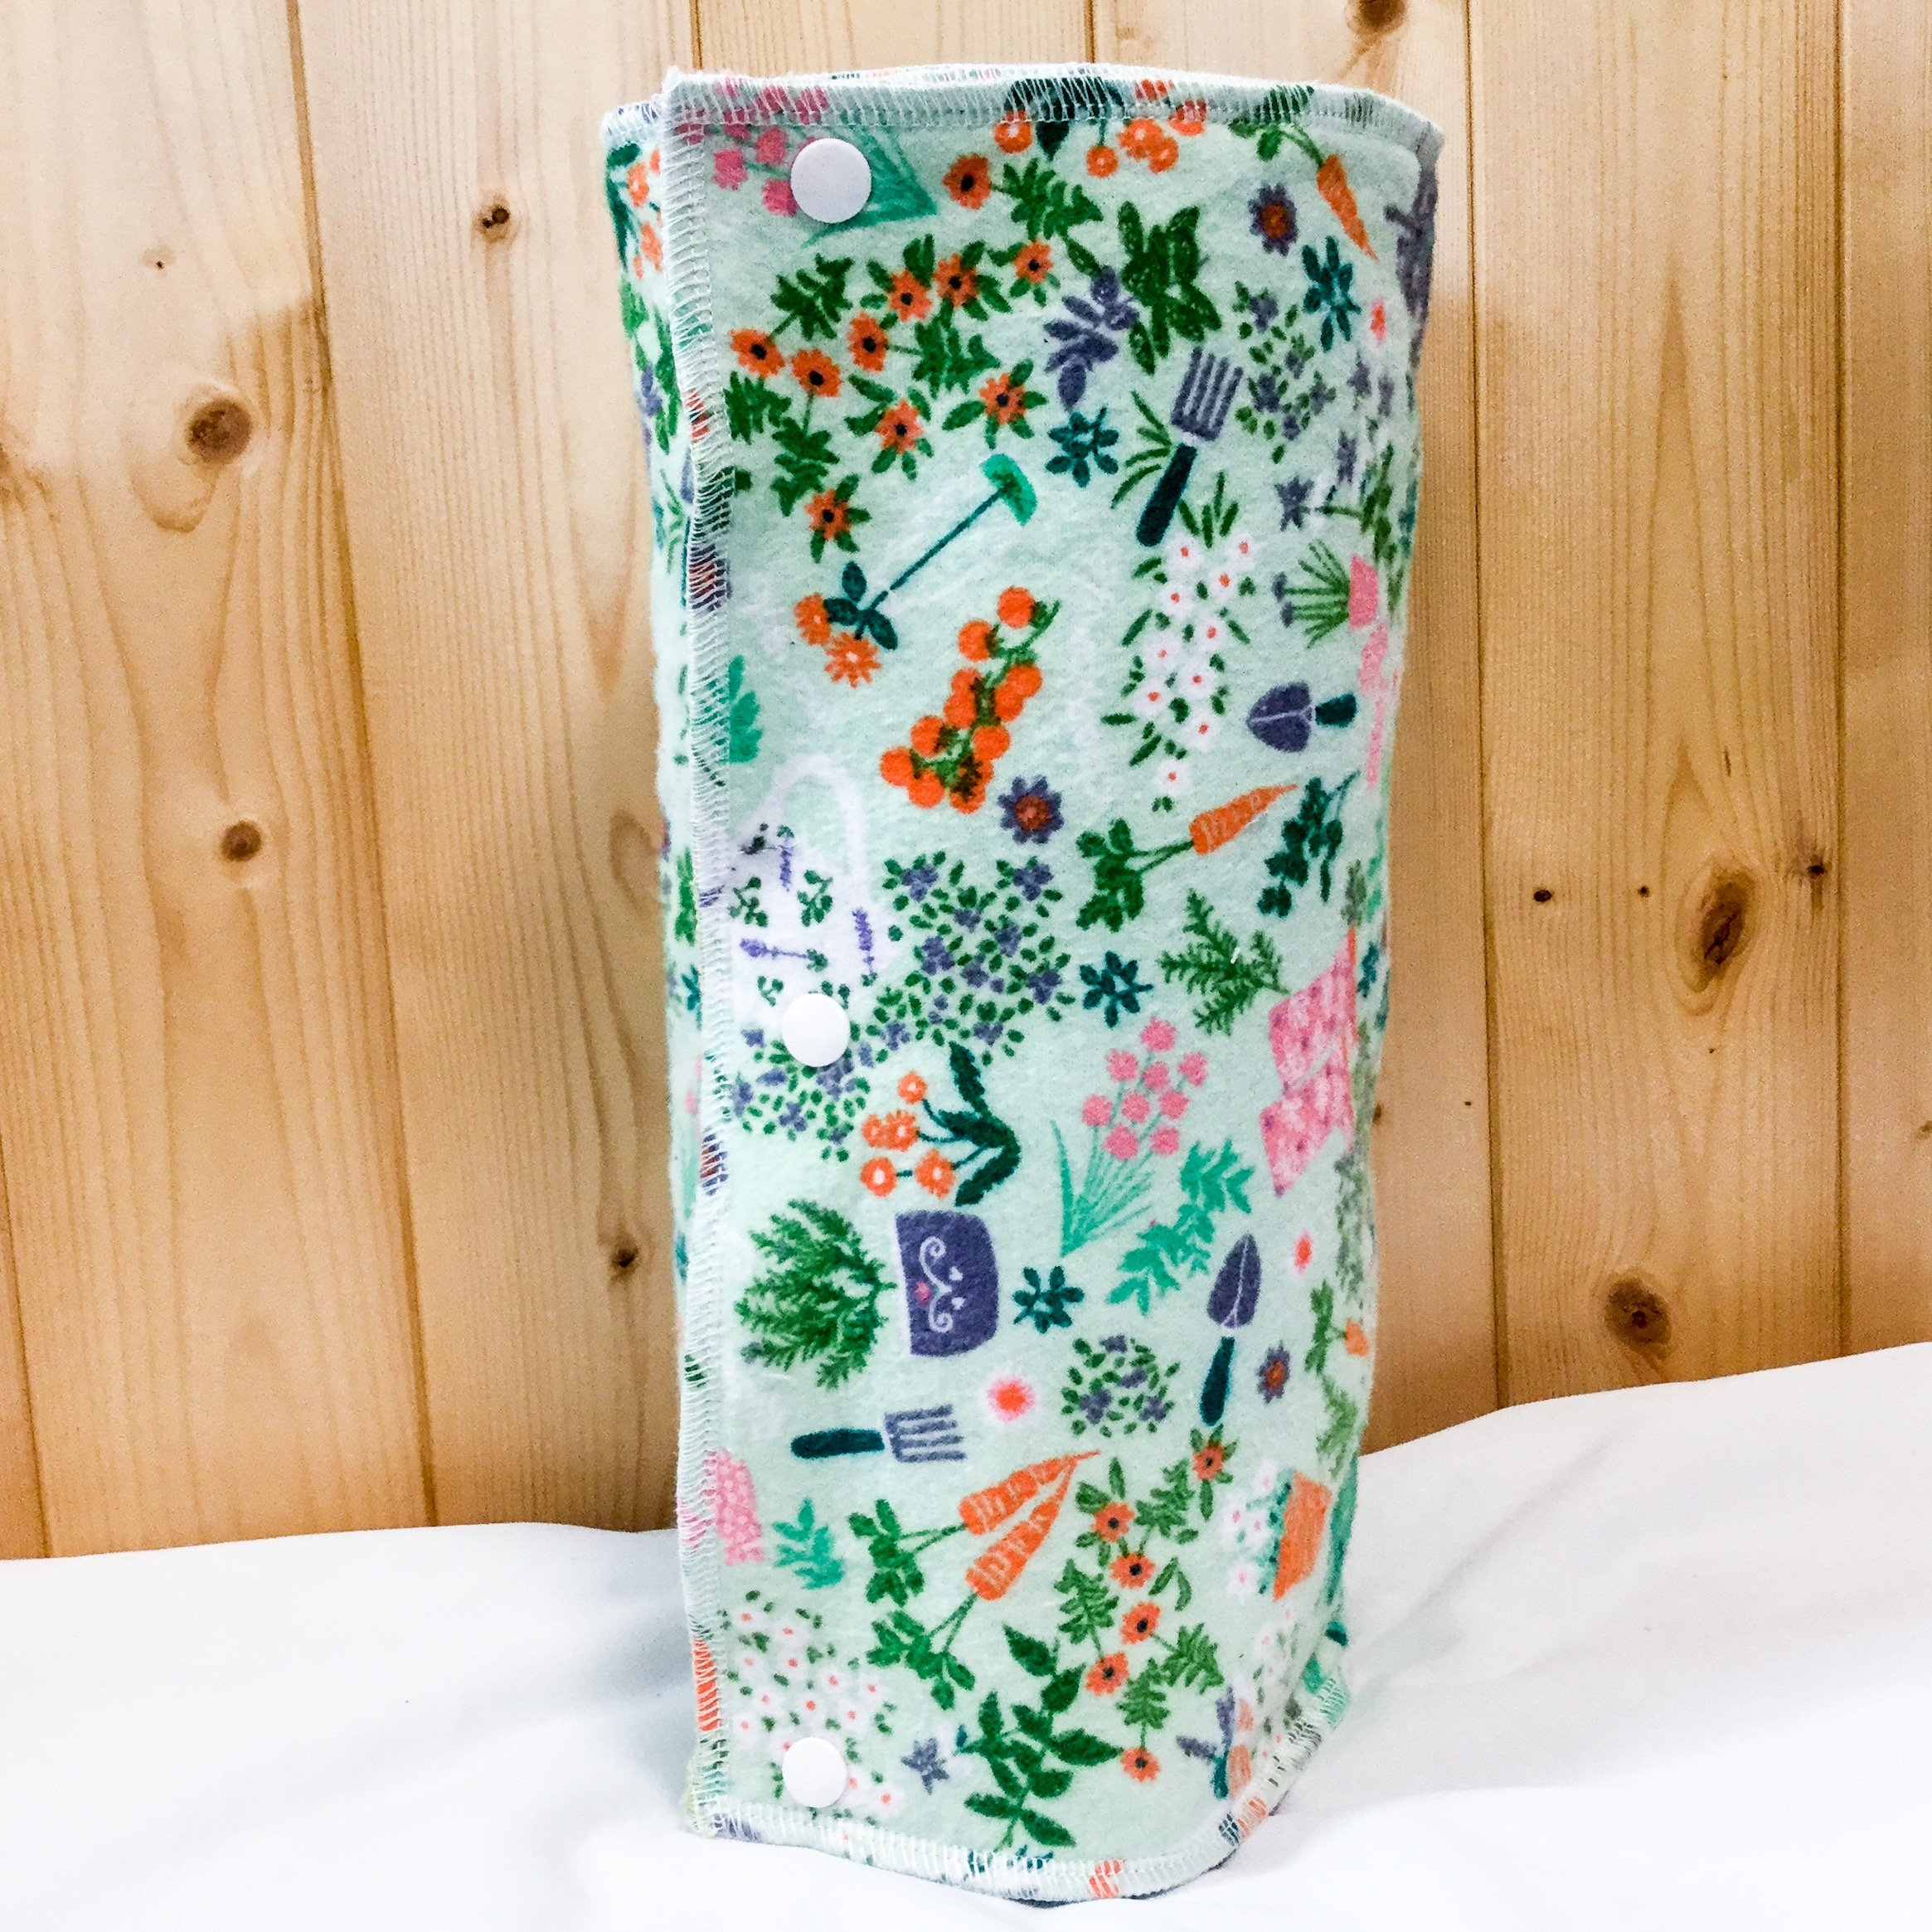 Unpaper Towels, Snapkins, Reusable ''Paper'' Towels, Set of 12, Garden Print